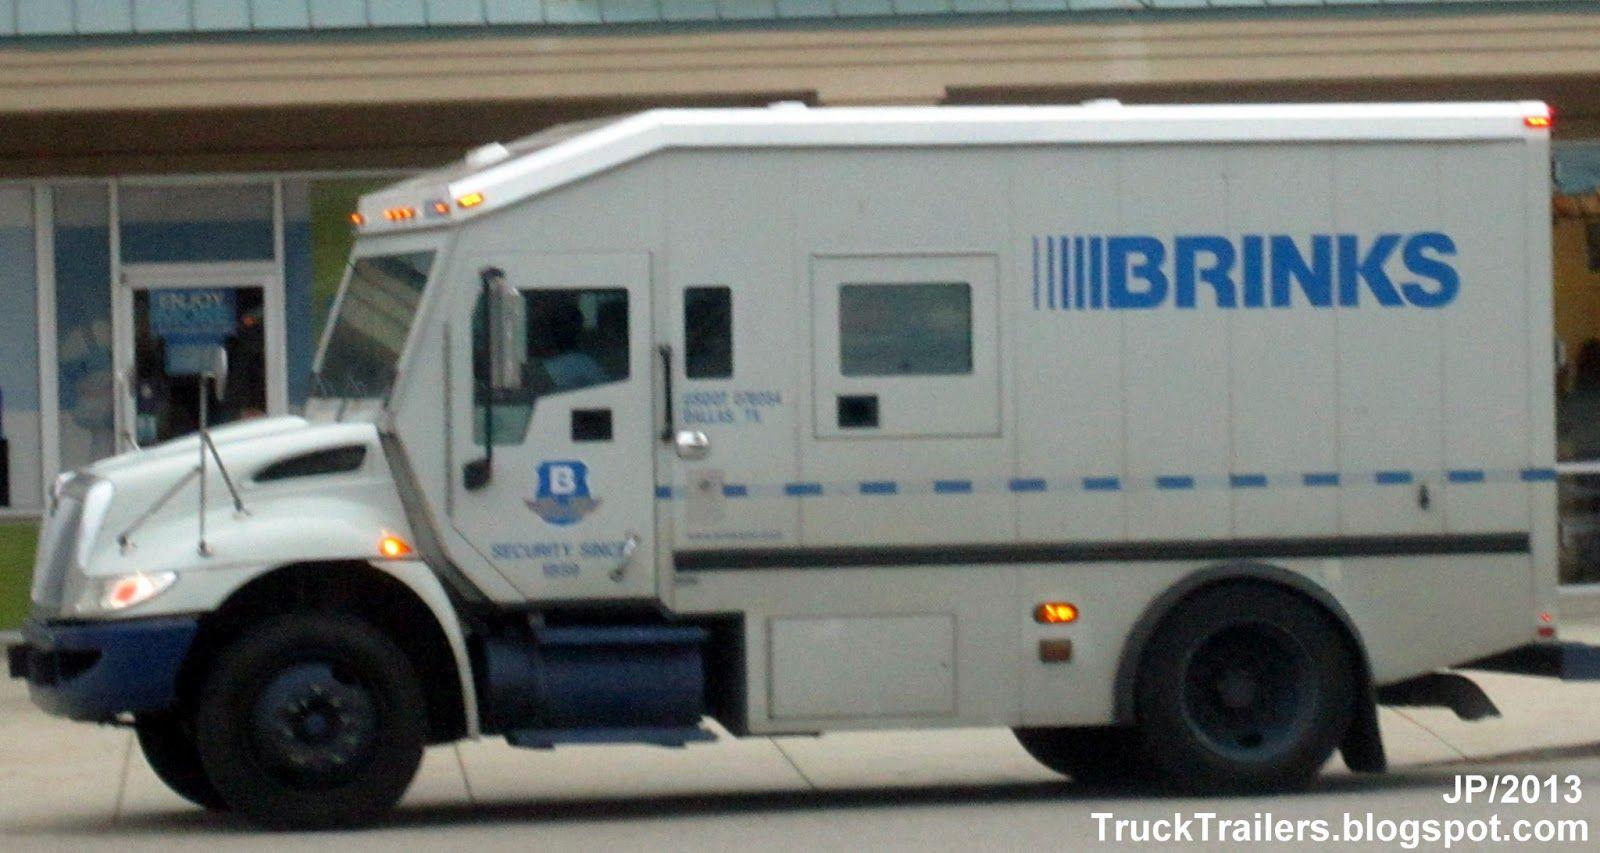 Armored Bank Trucks | BRINKS Inc. Armored Car, Brinks ...